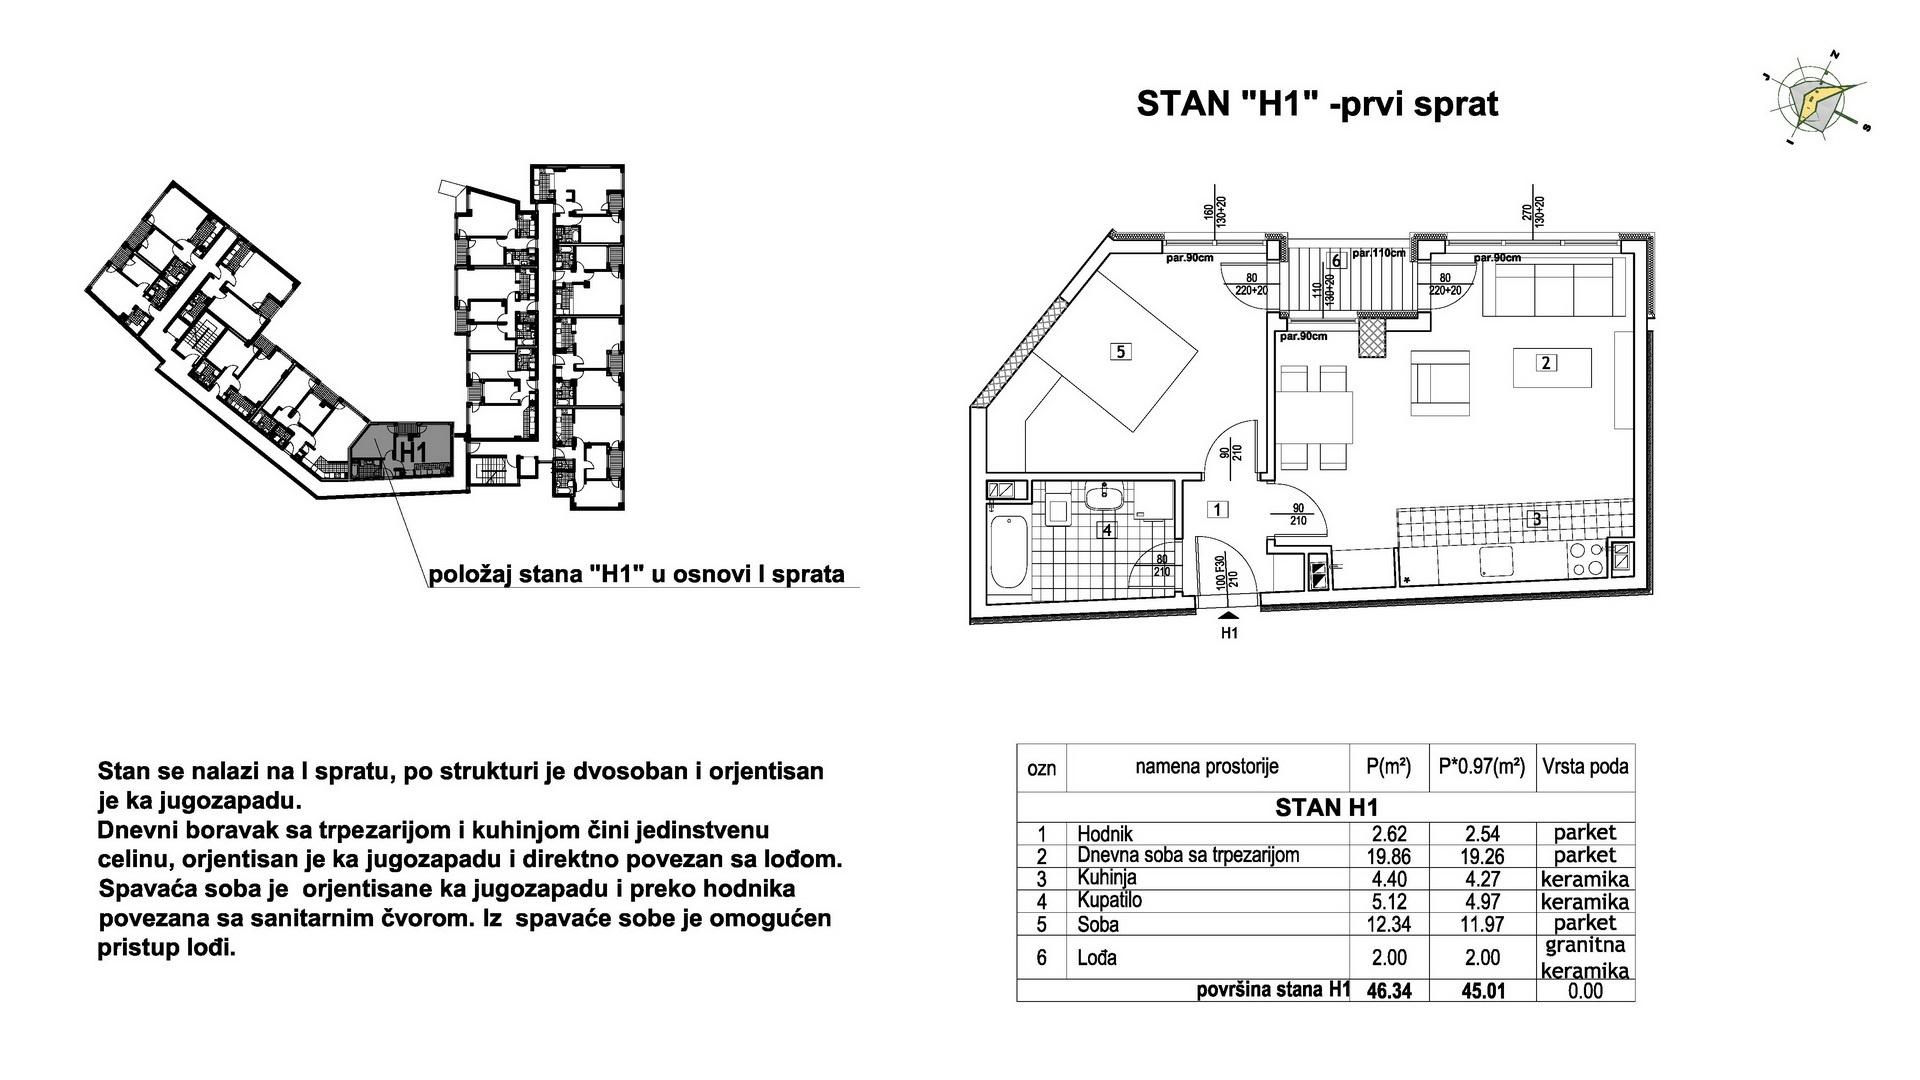 Objekat u Prešernovoj bb - Stan H1